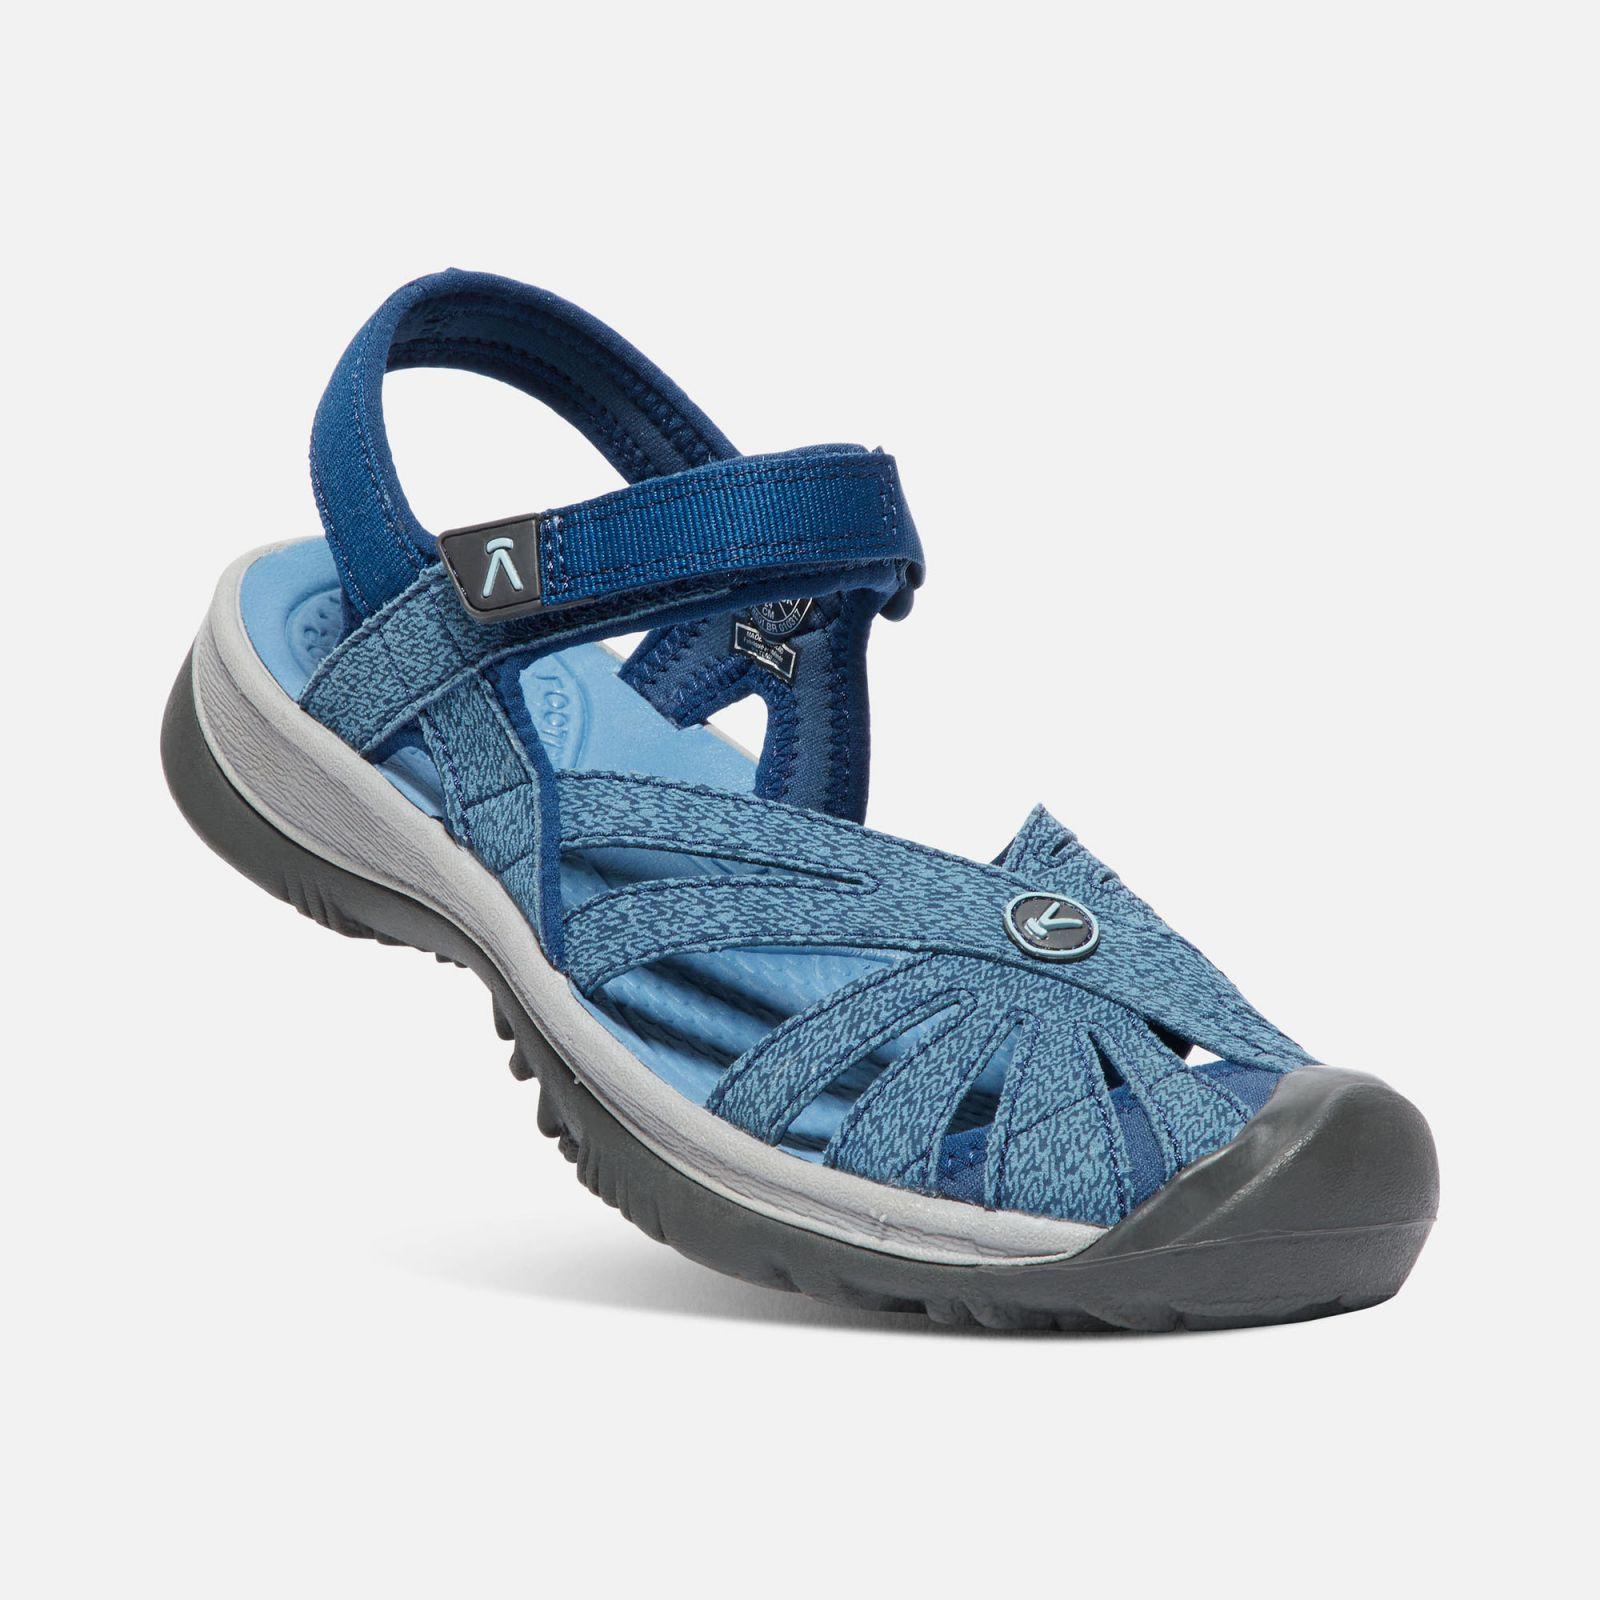 Tazz-Sport - KEEN Rose Sandal W Blue opal / Provincial blue Dámský sandál